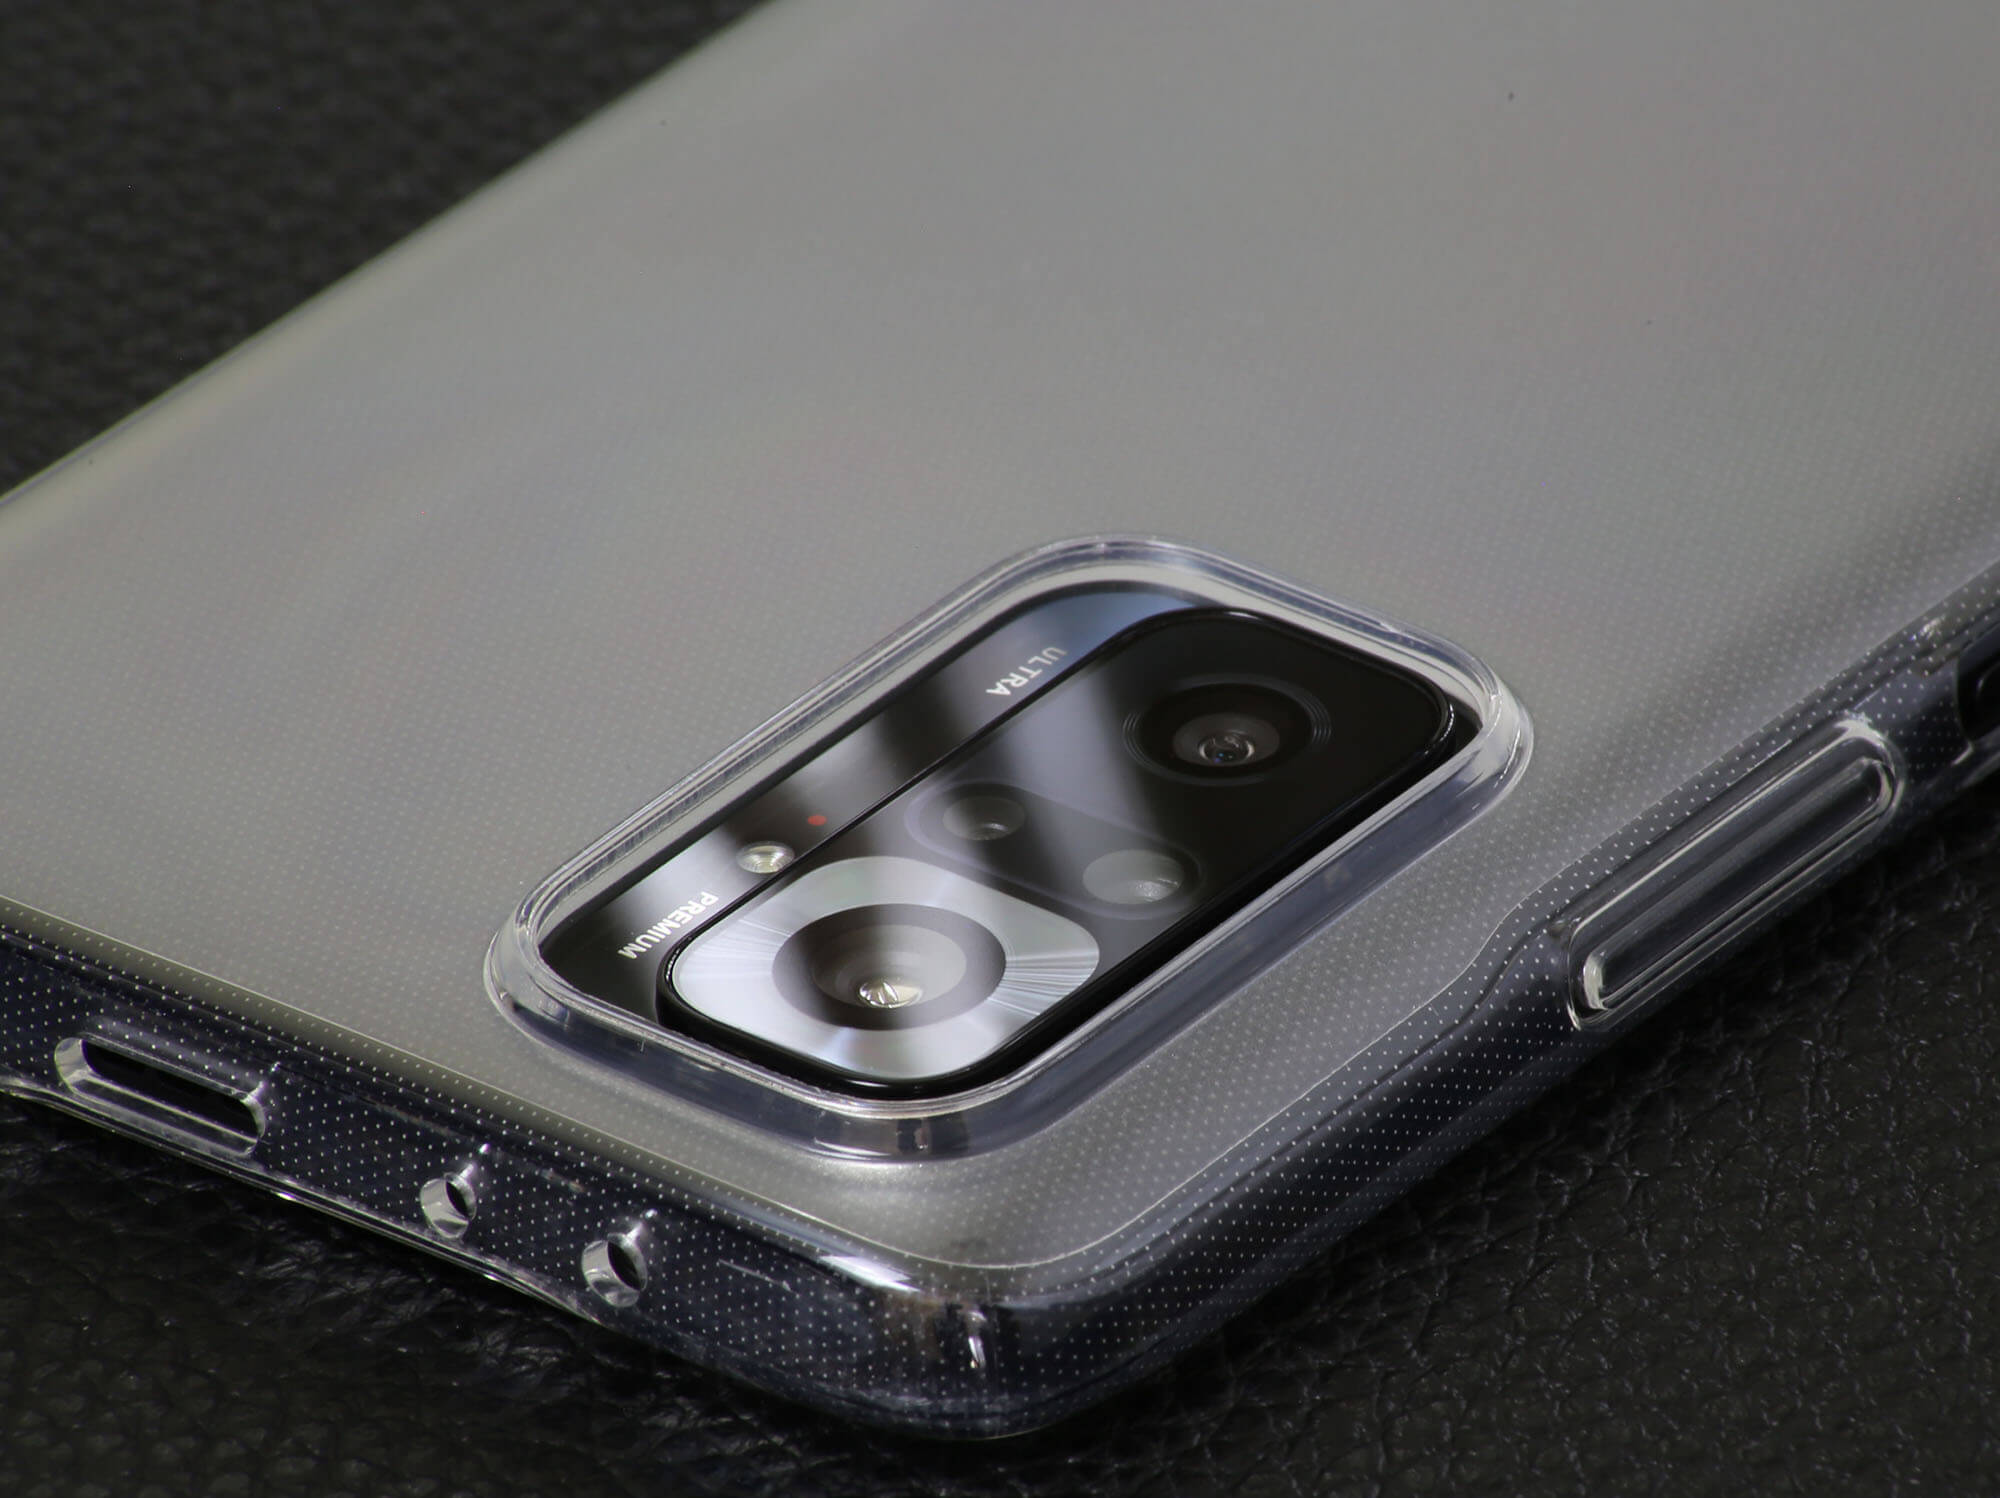 Redmi Note 10 Proの付属ケースはカメラリングが傷からしっかりとレンズをガード